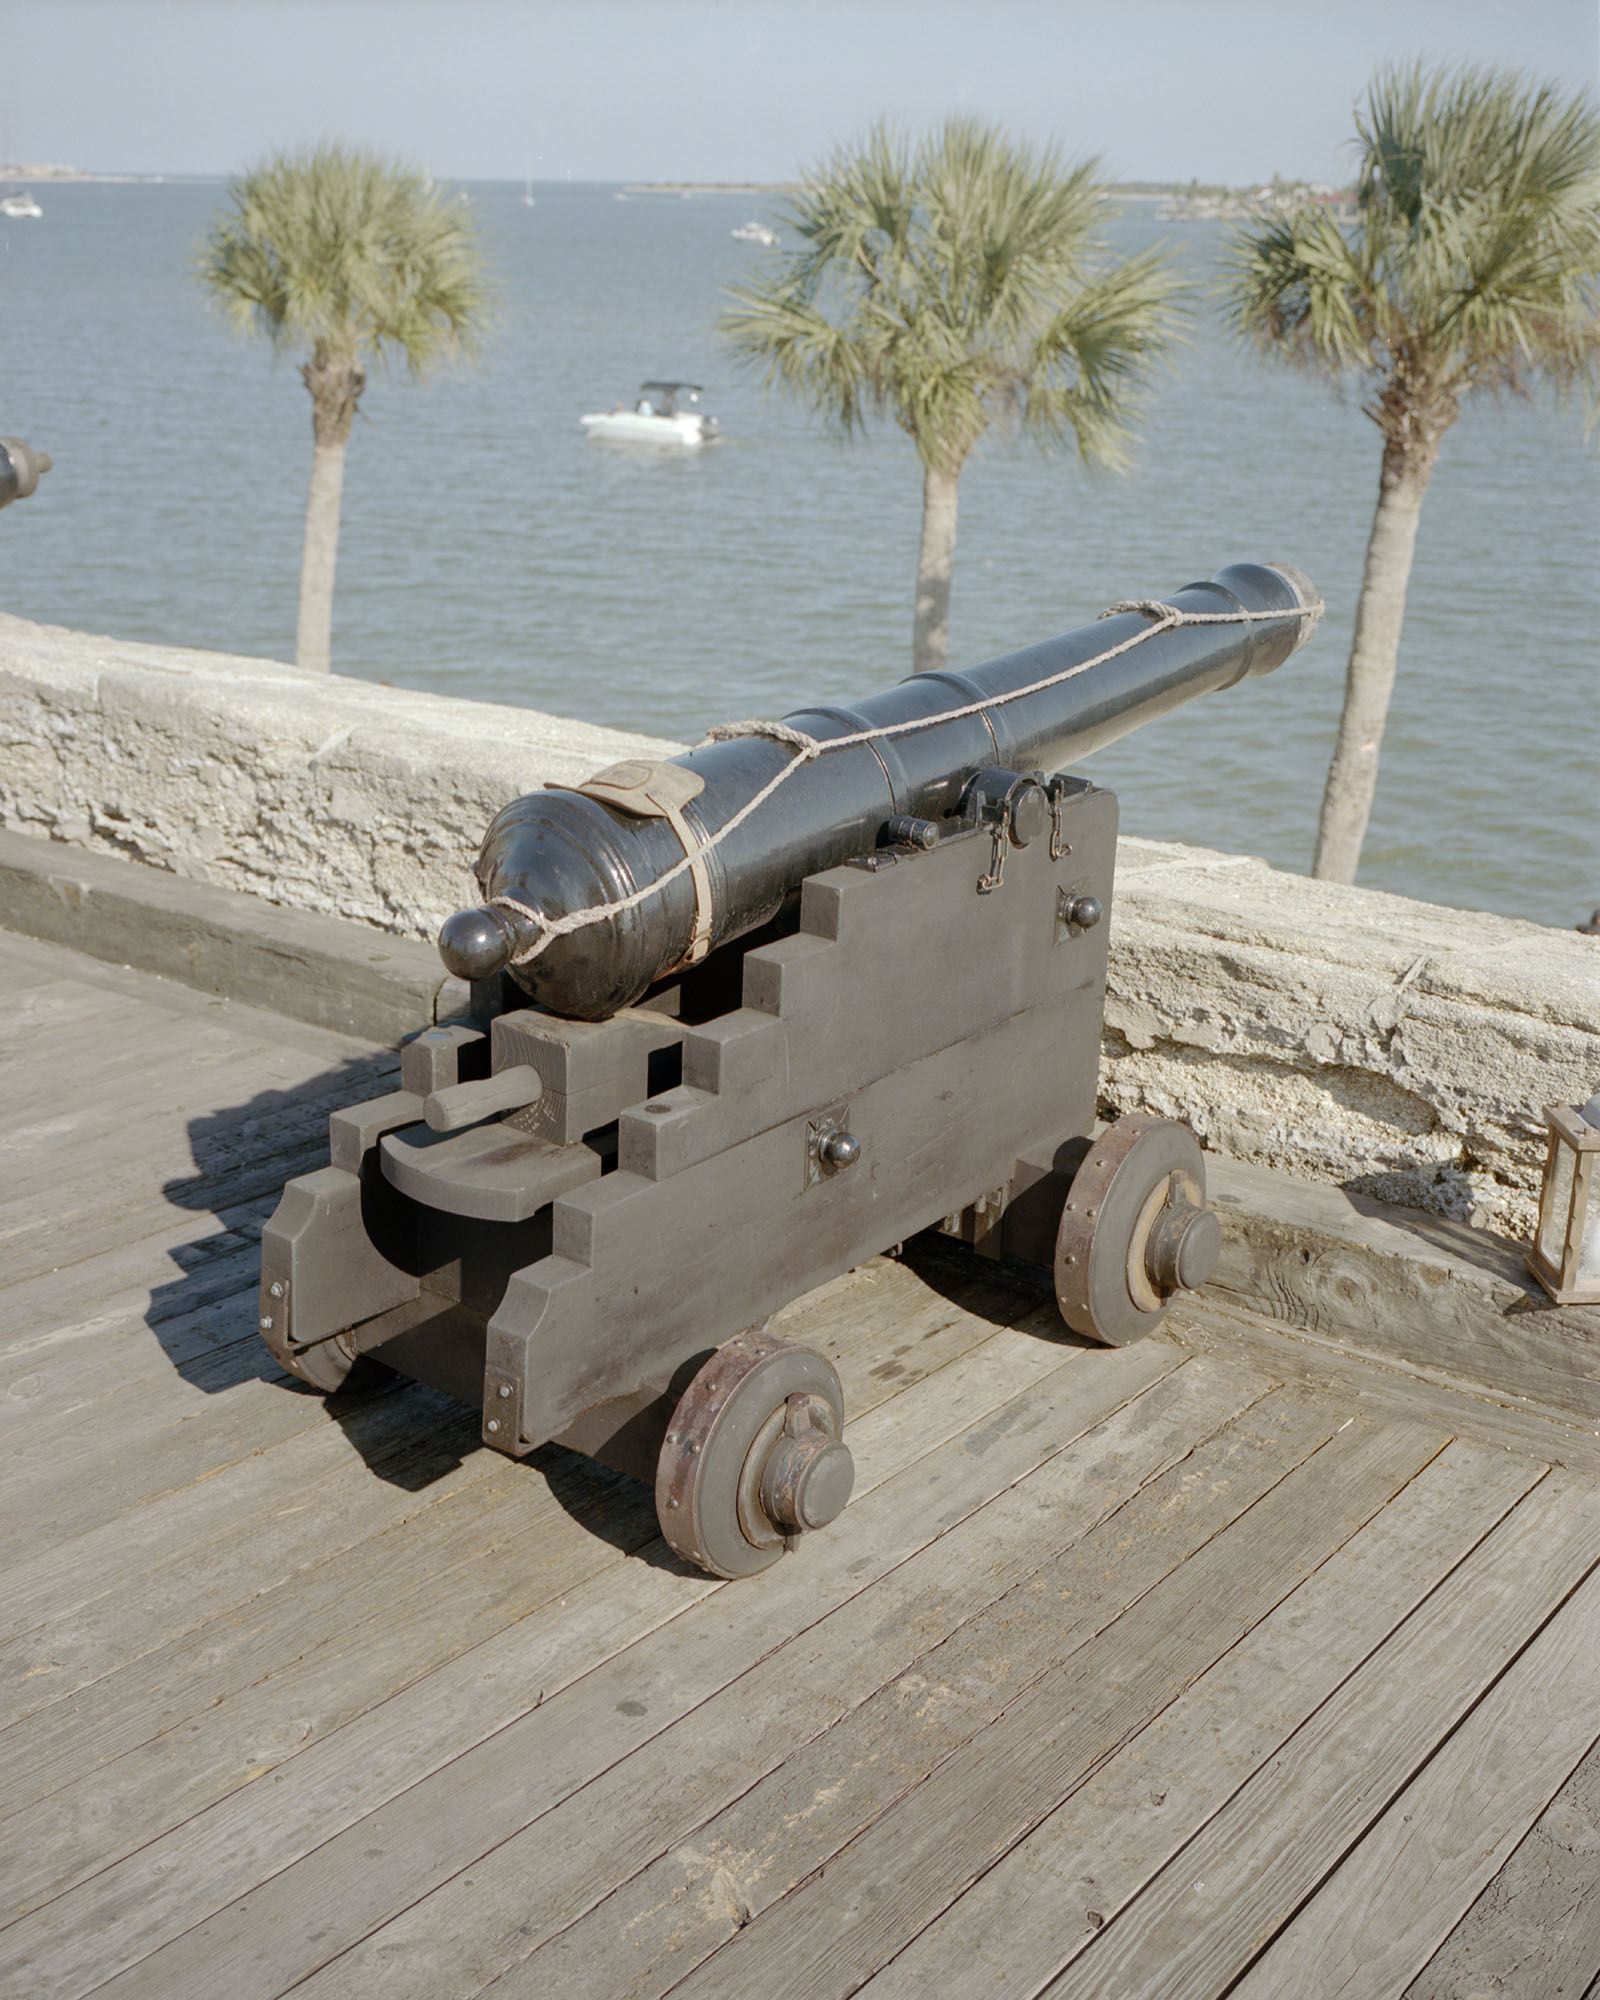 Cannon005.jpg